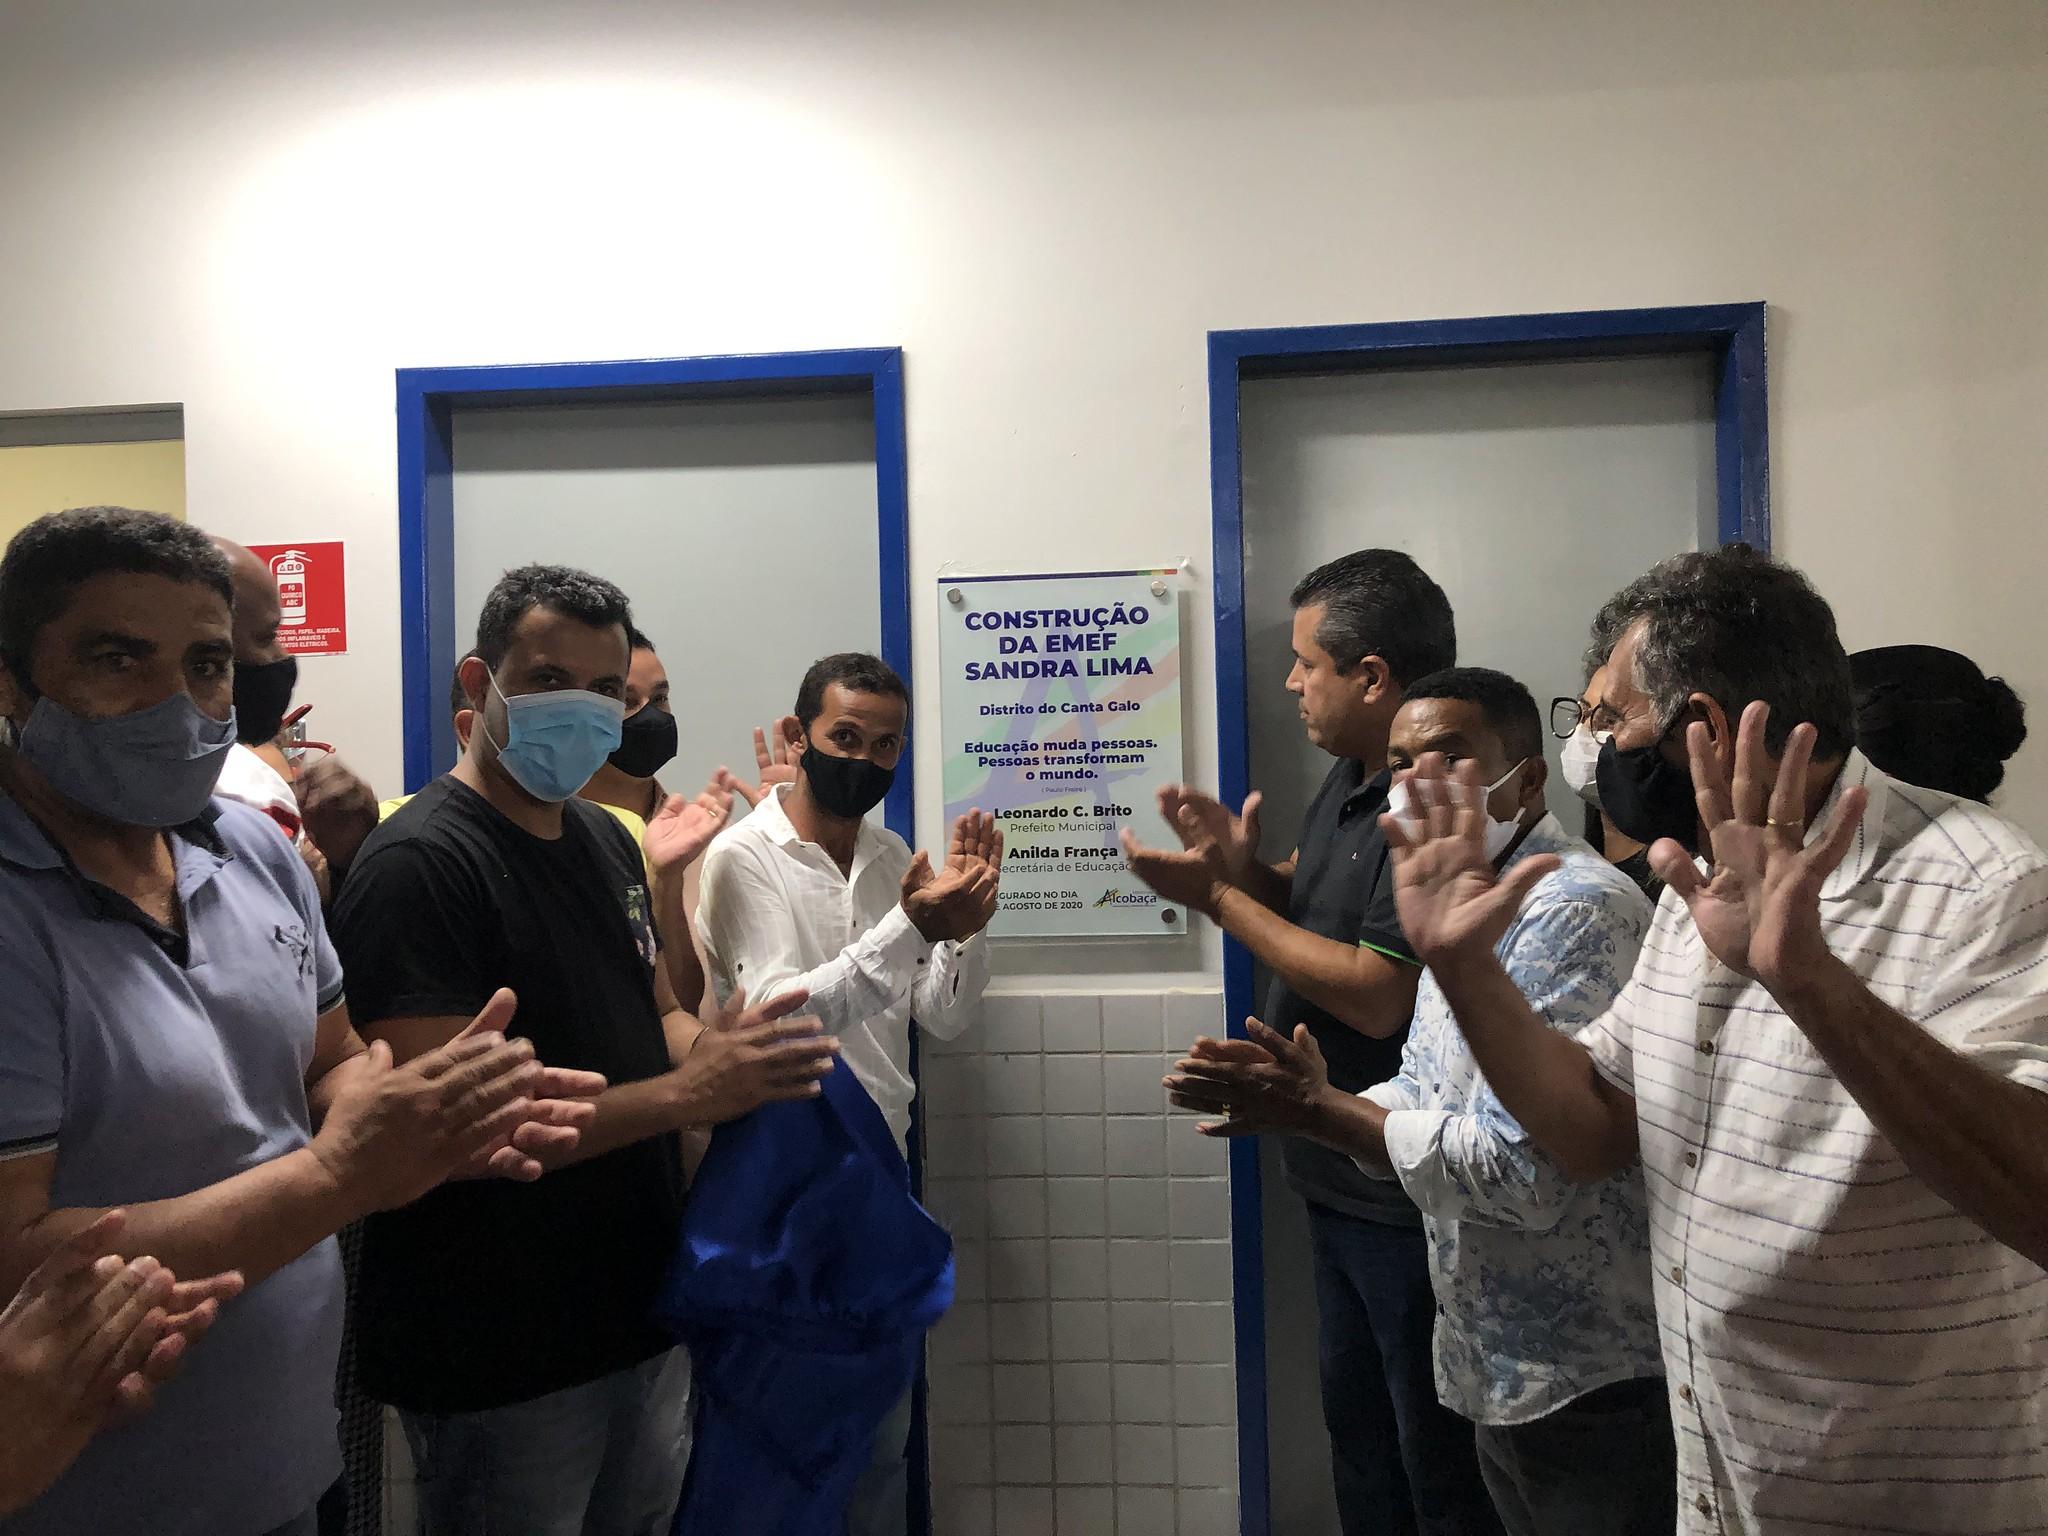 INAUGURA DA EMEF SANDRA LIMA NO CANTA GALO (538)